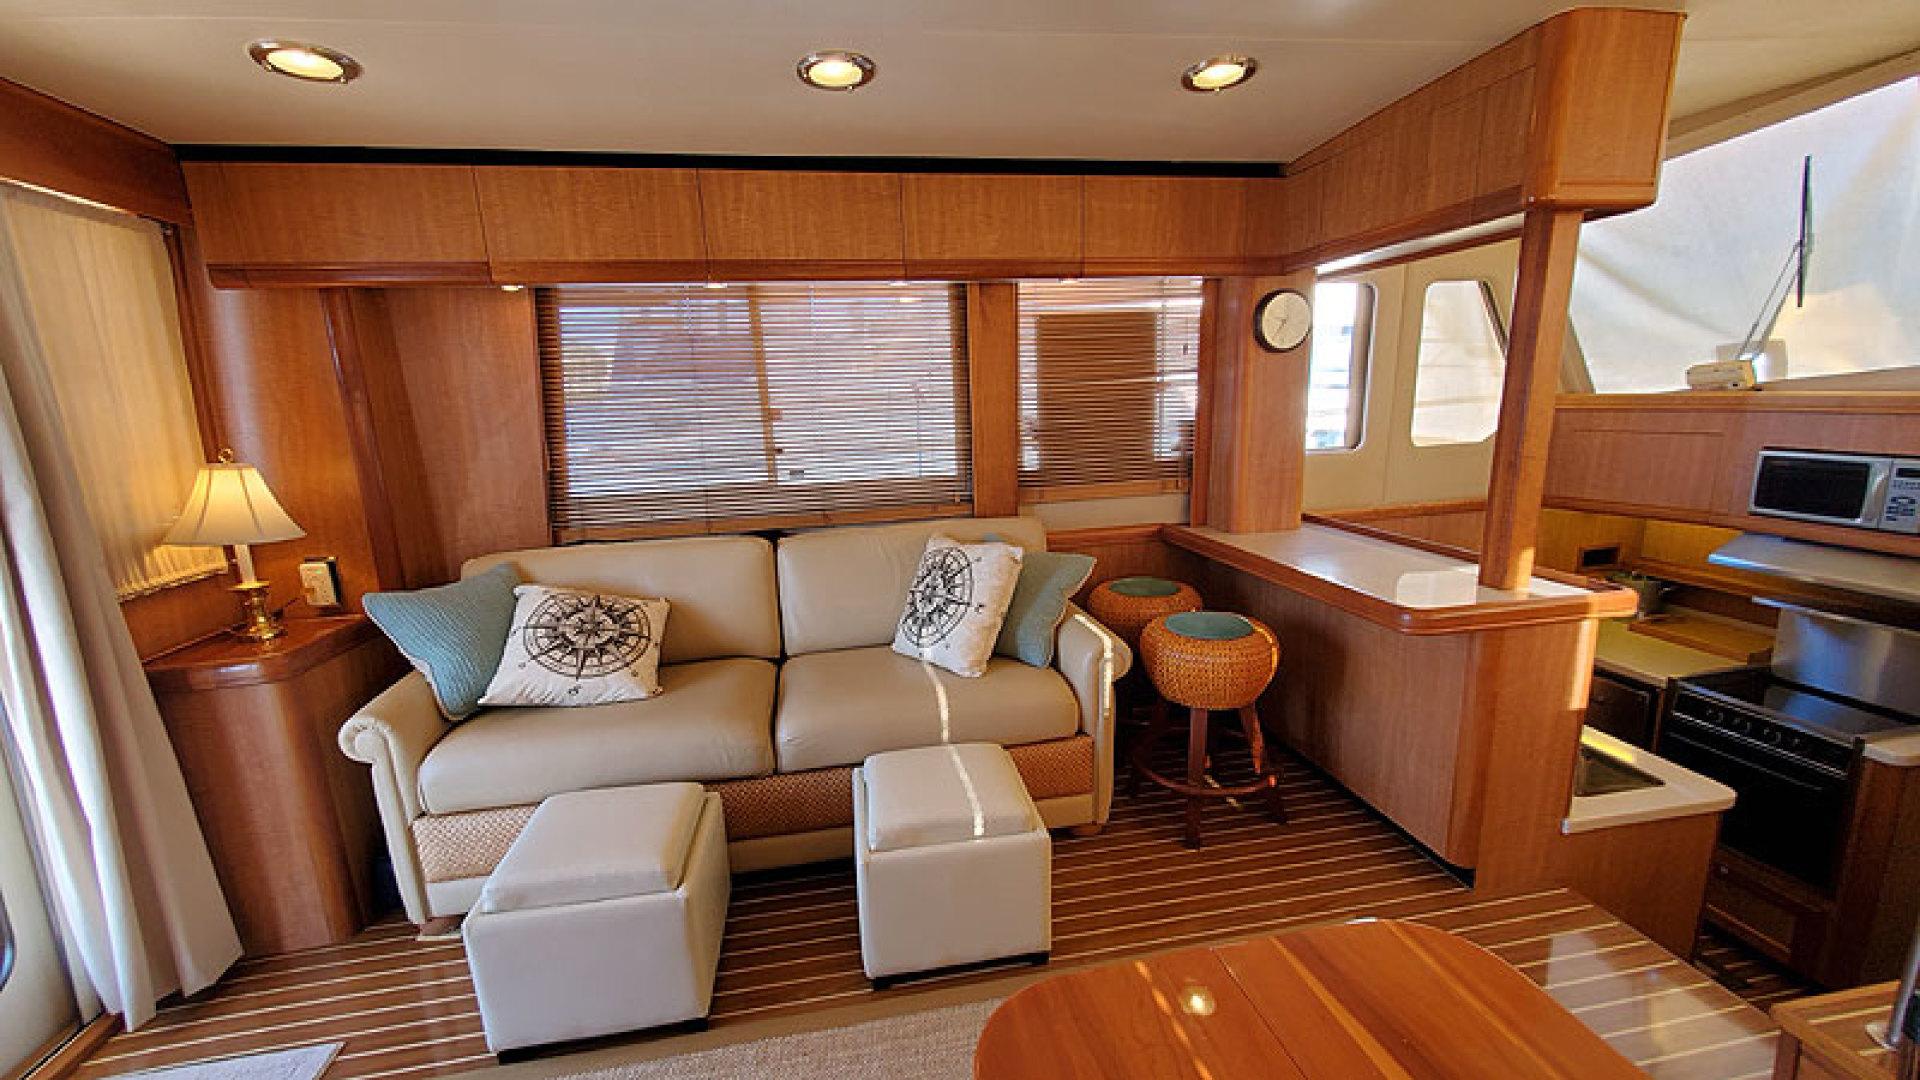 Mainship-430 Sedan 2006-Windy Cove II Venice-Florida-United States-1266376 | Thumbnail